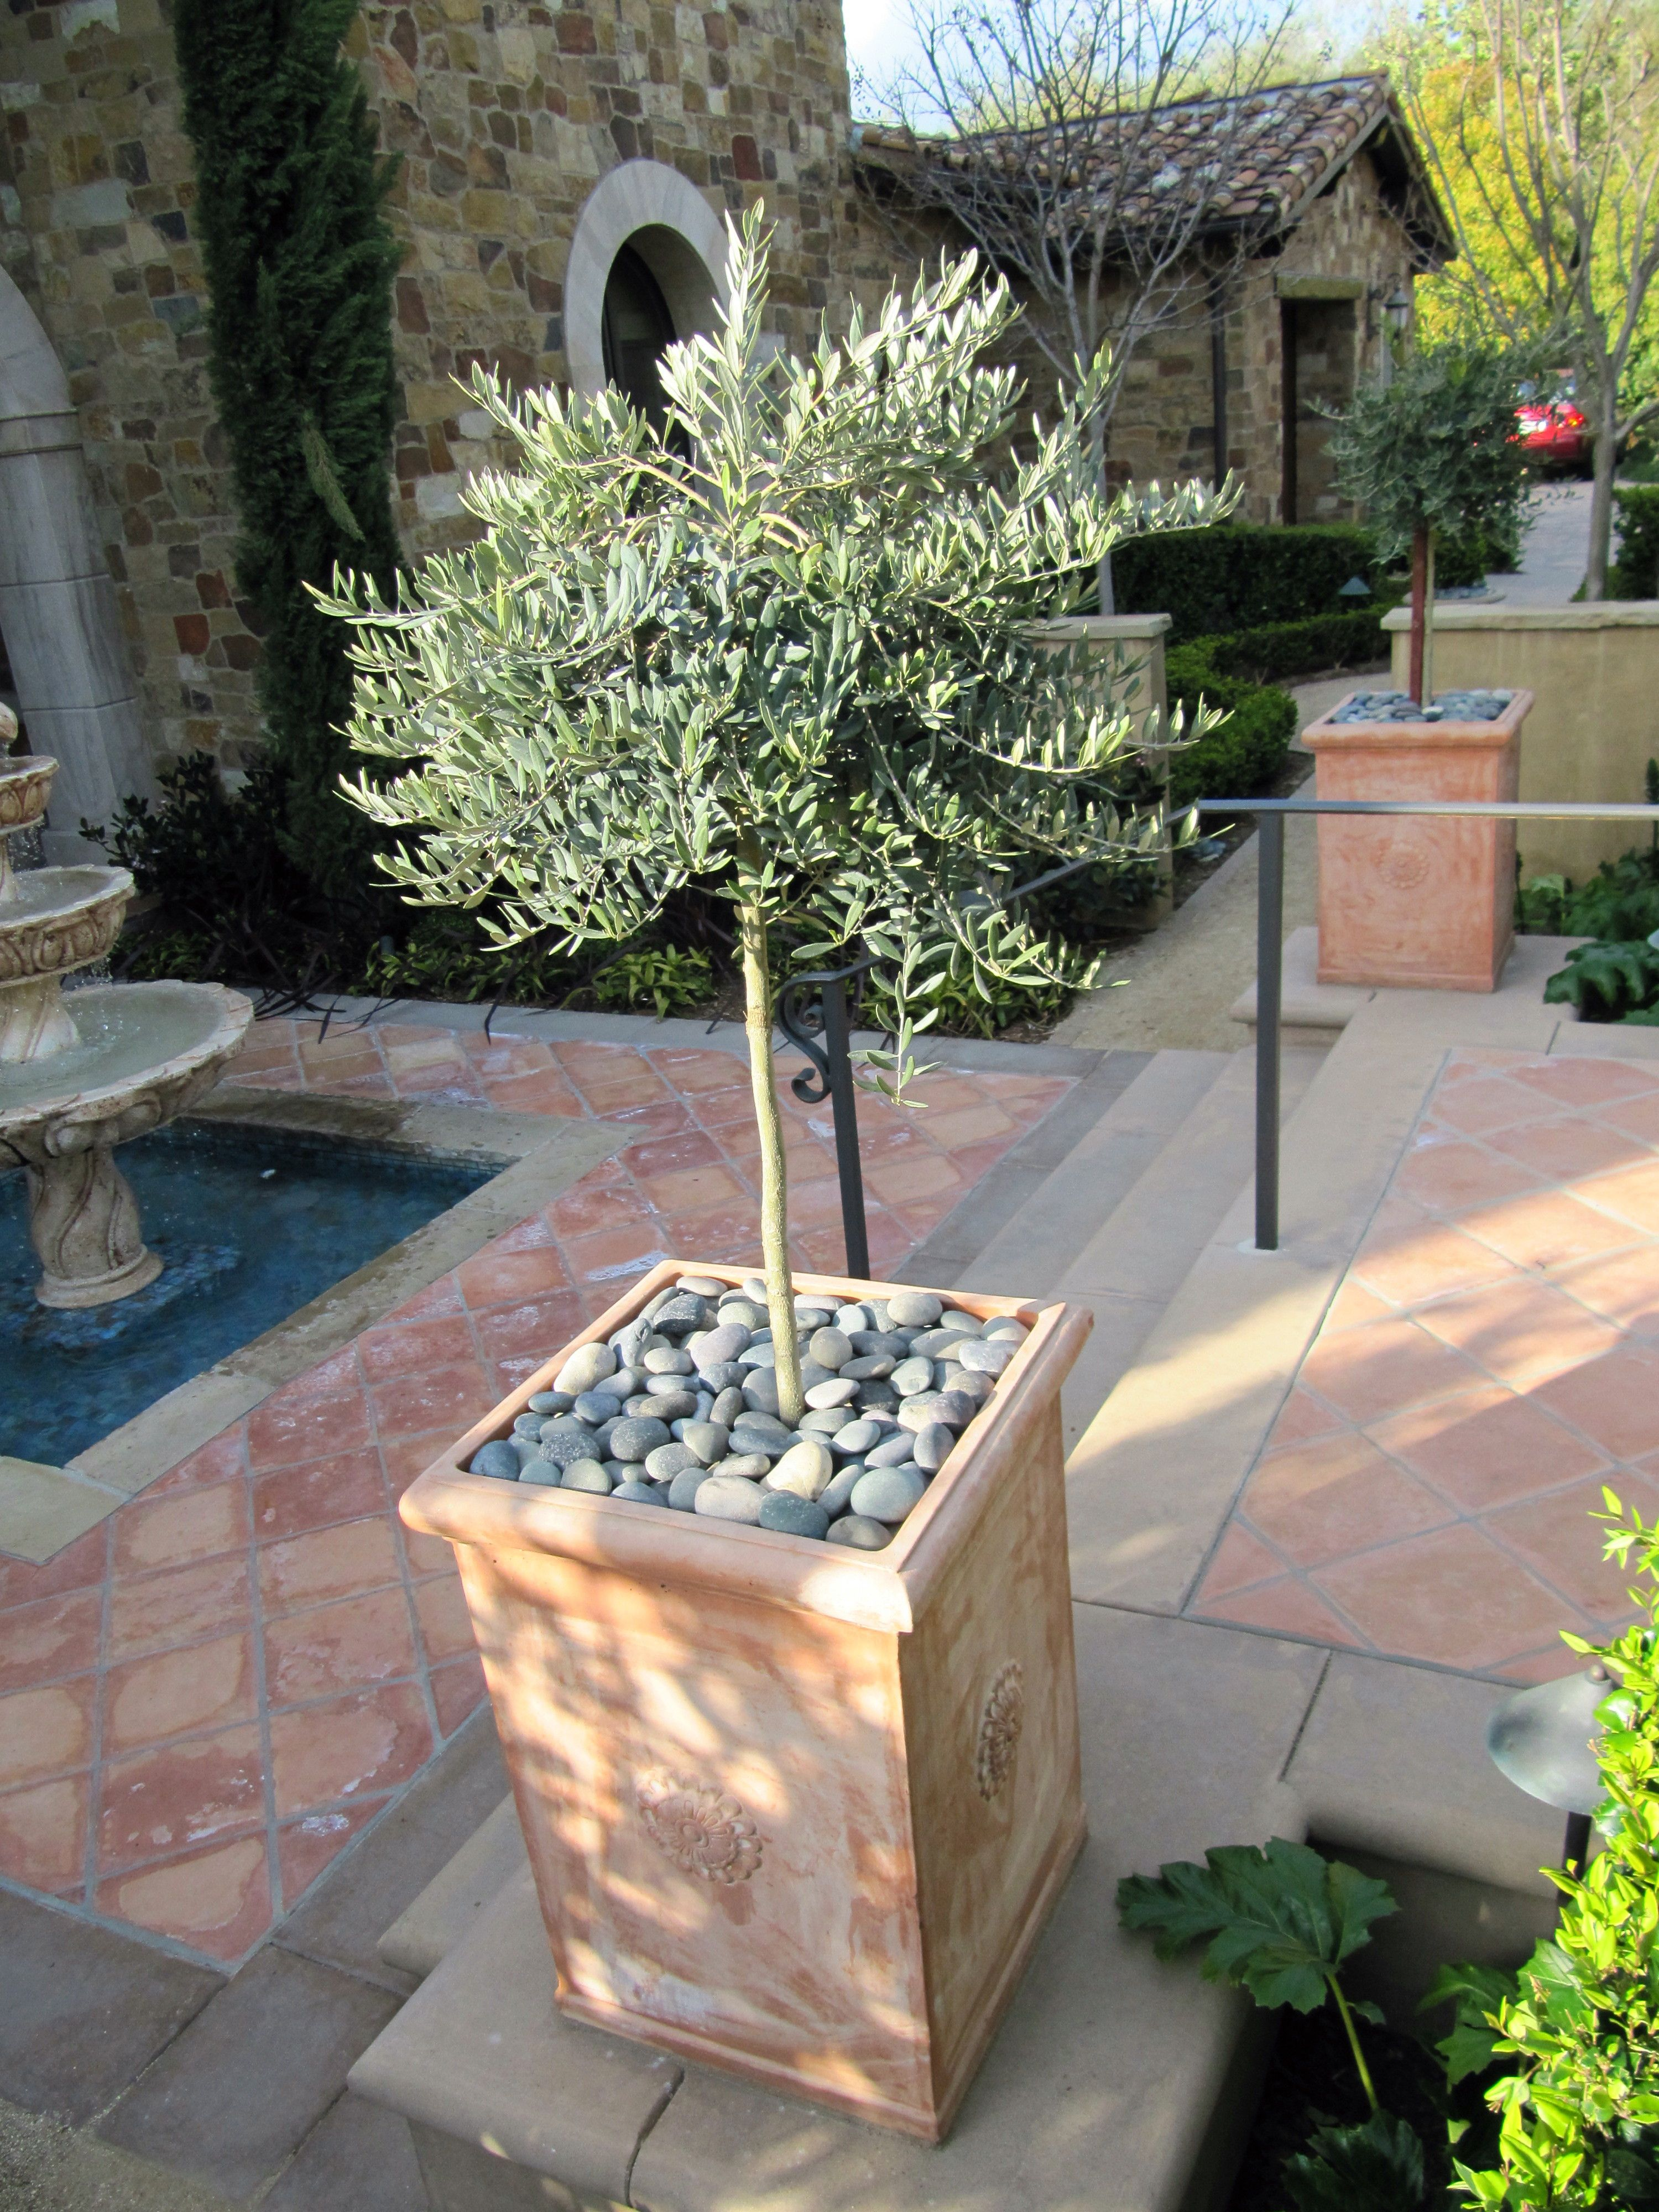 Dwarf Olive Tree In Square Ceramic Pots Like The Stones